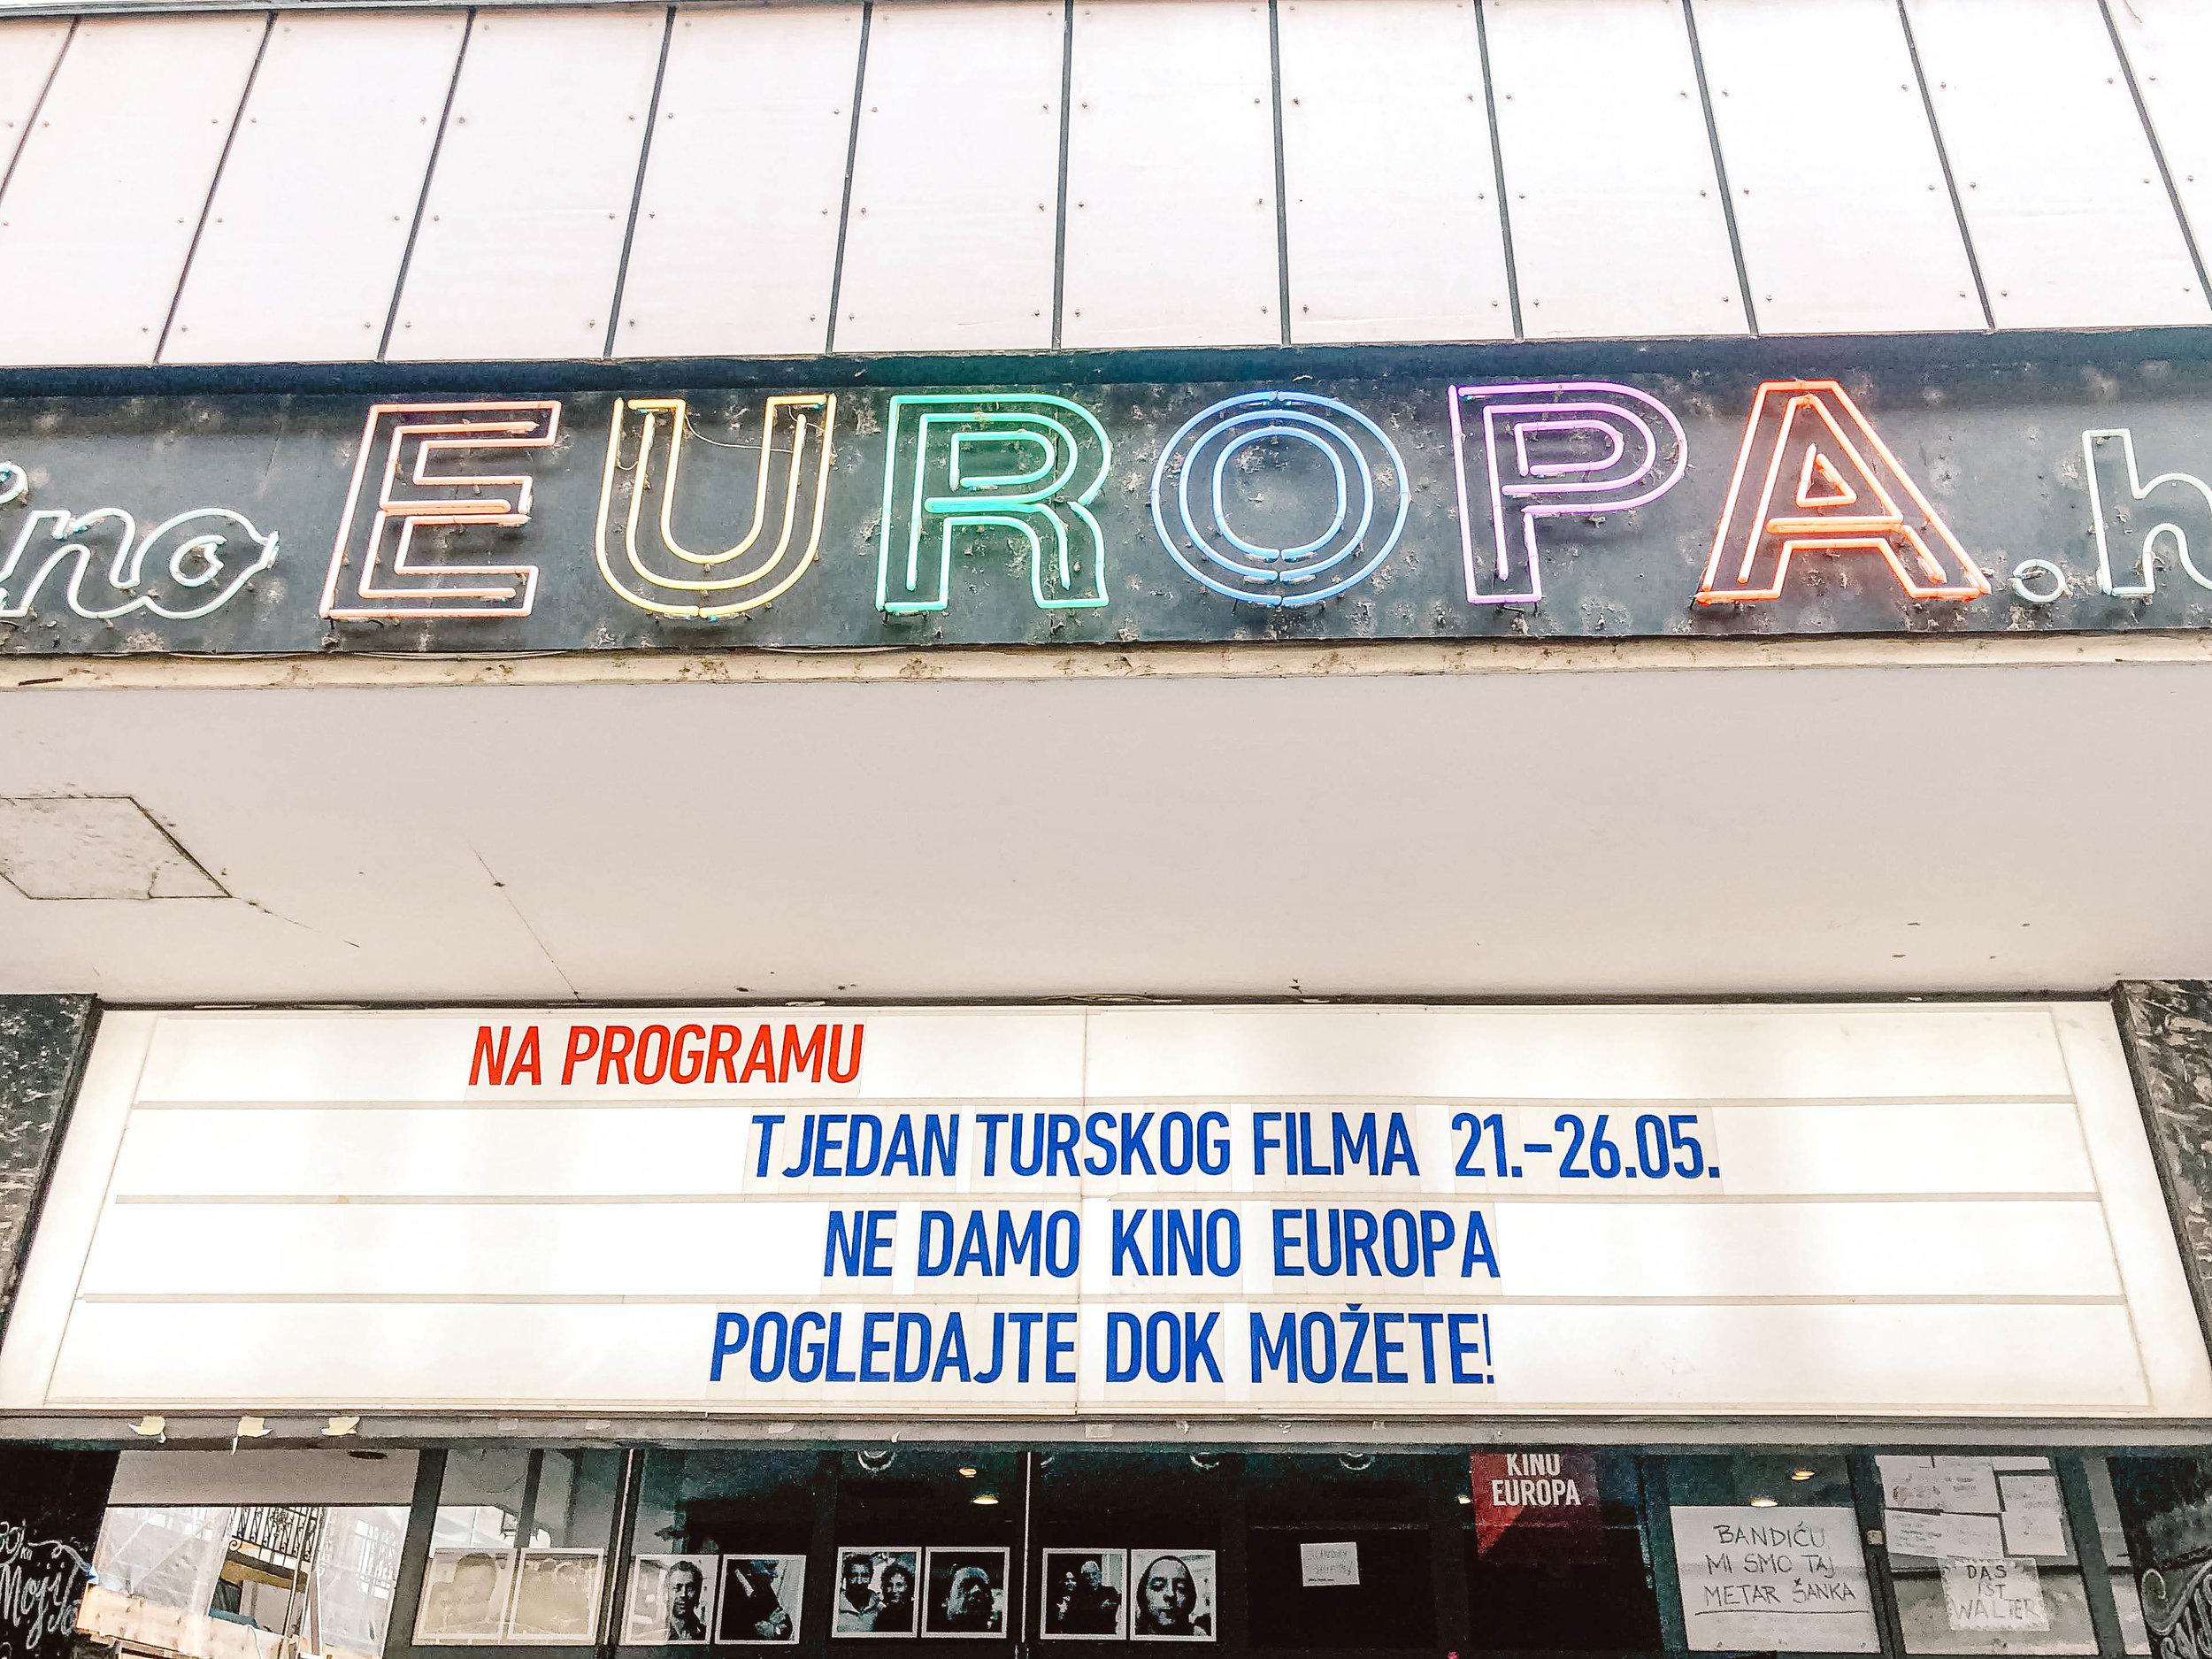 Zagreb Kino Europa.jpg